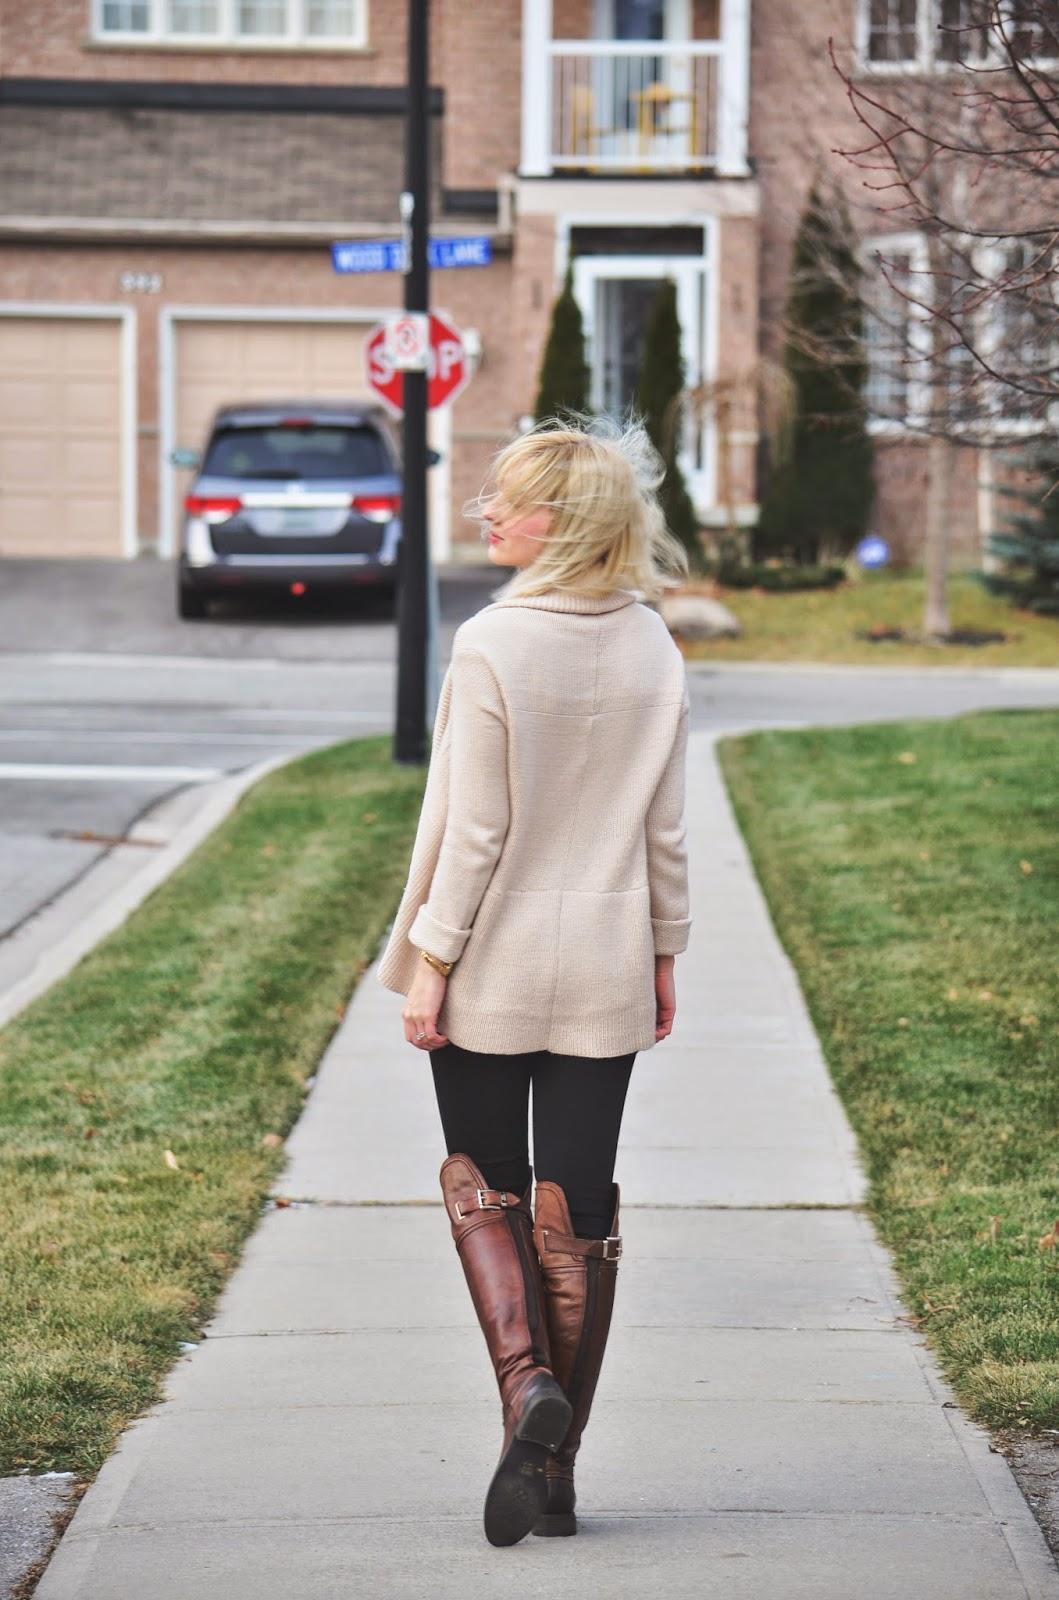 Style, OOTD, Casual, OldNavy, Zara, Vince Camuto, Smart Set, comfy, oversized cardigan, beige cardigan, cardigan style